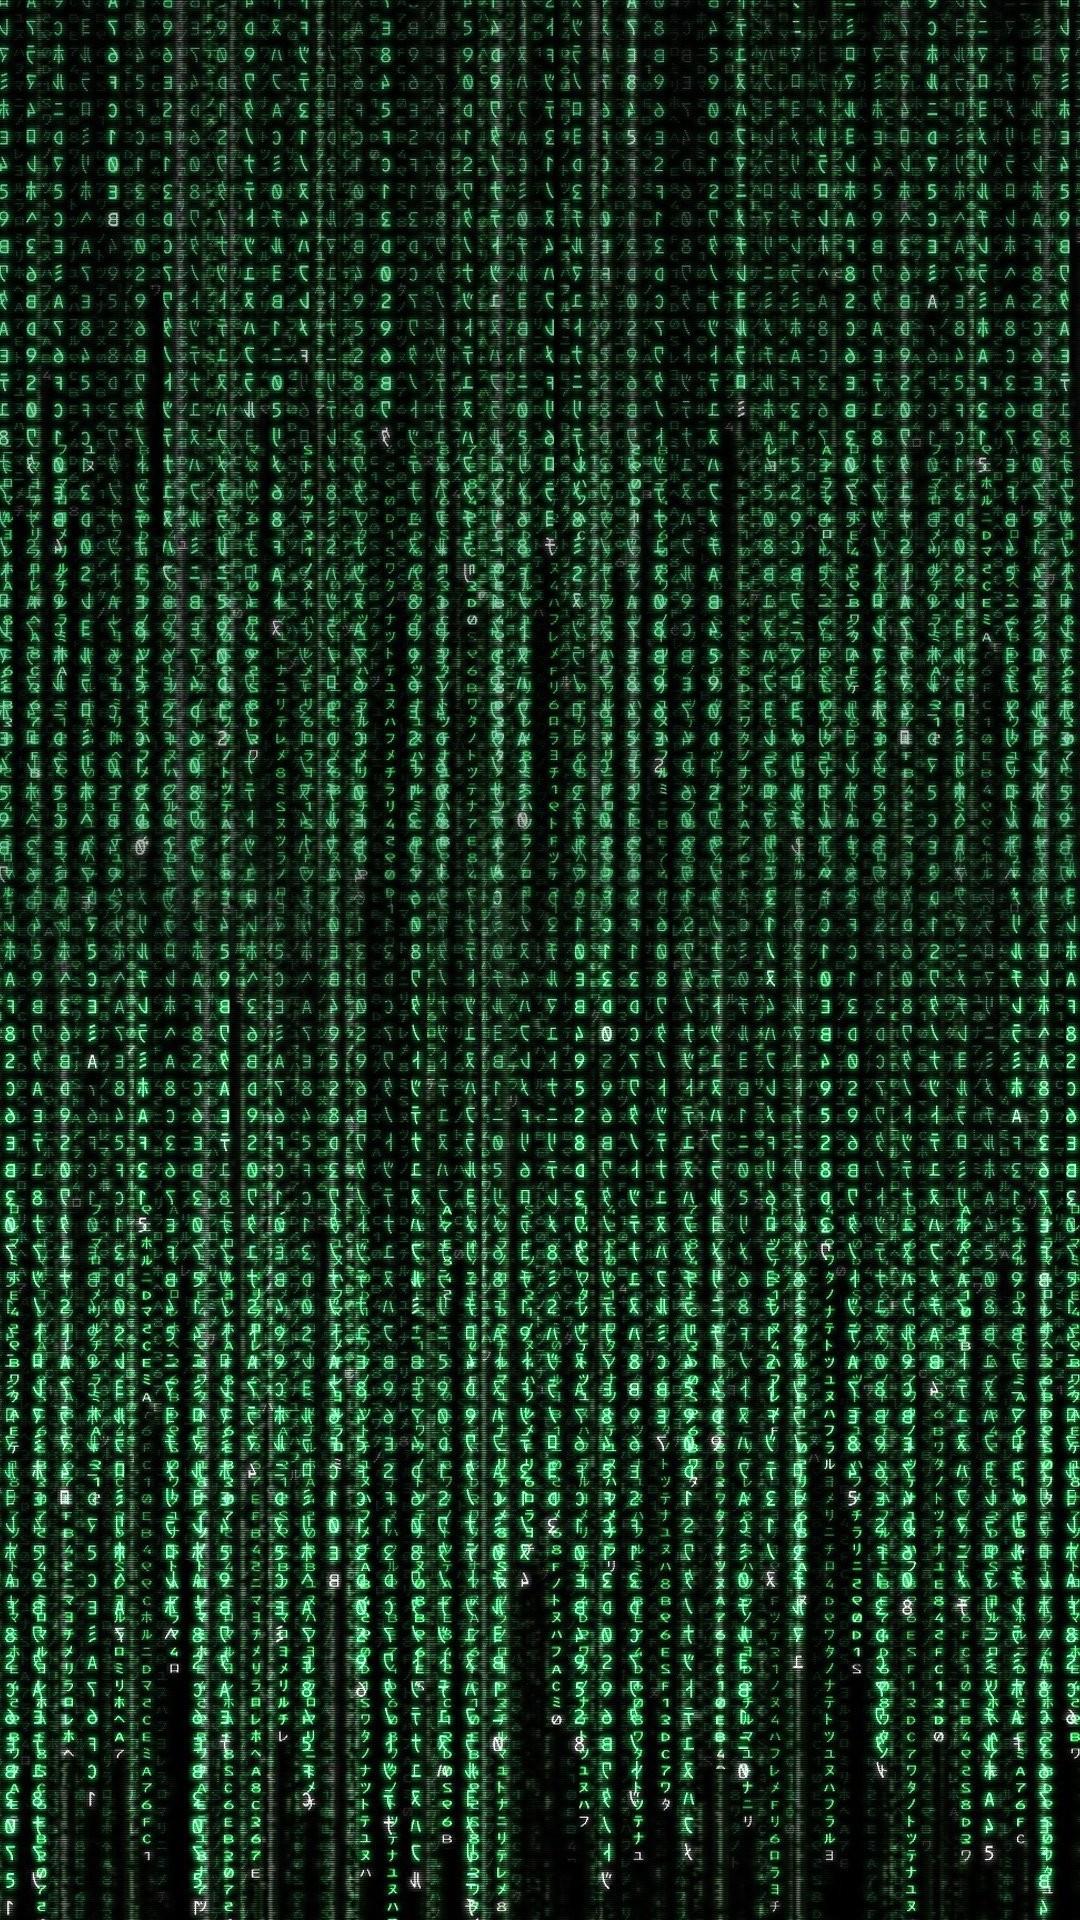 Wallpaper : digital art, black background, portrait display, text, CGI, skyscraper, green, pattern, texture, The Matrix, falling, Chinese characters, ...